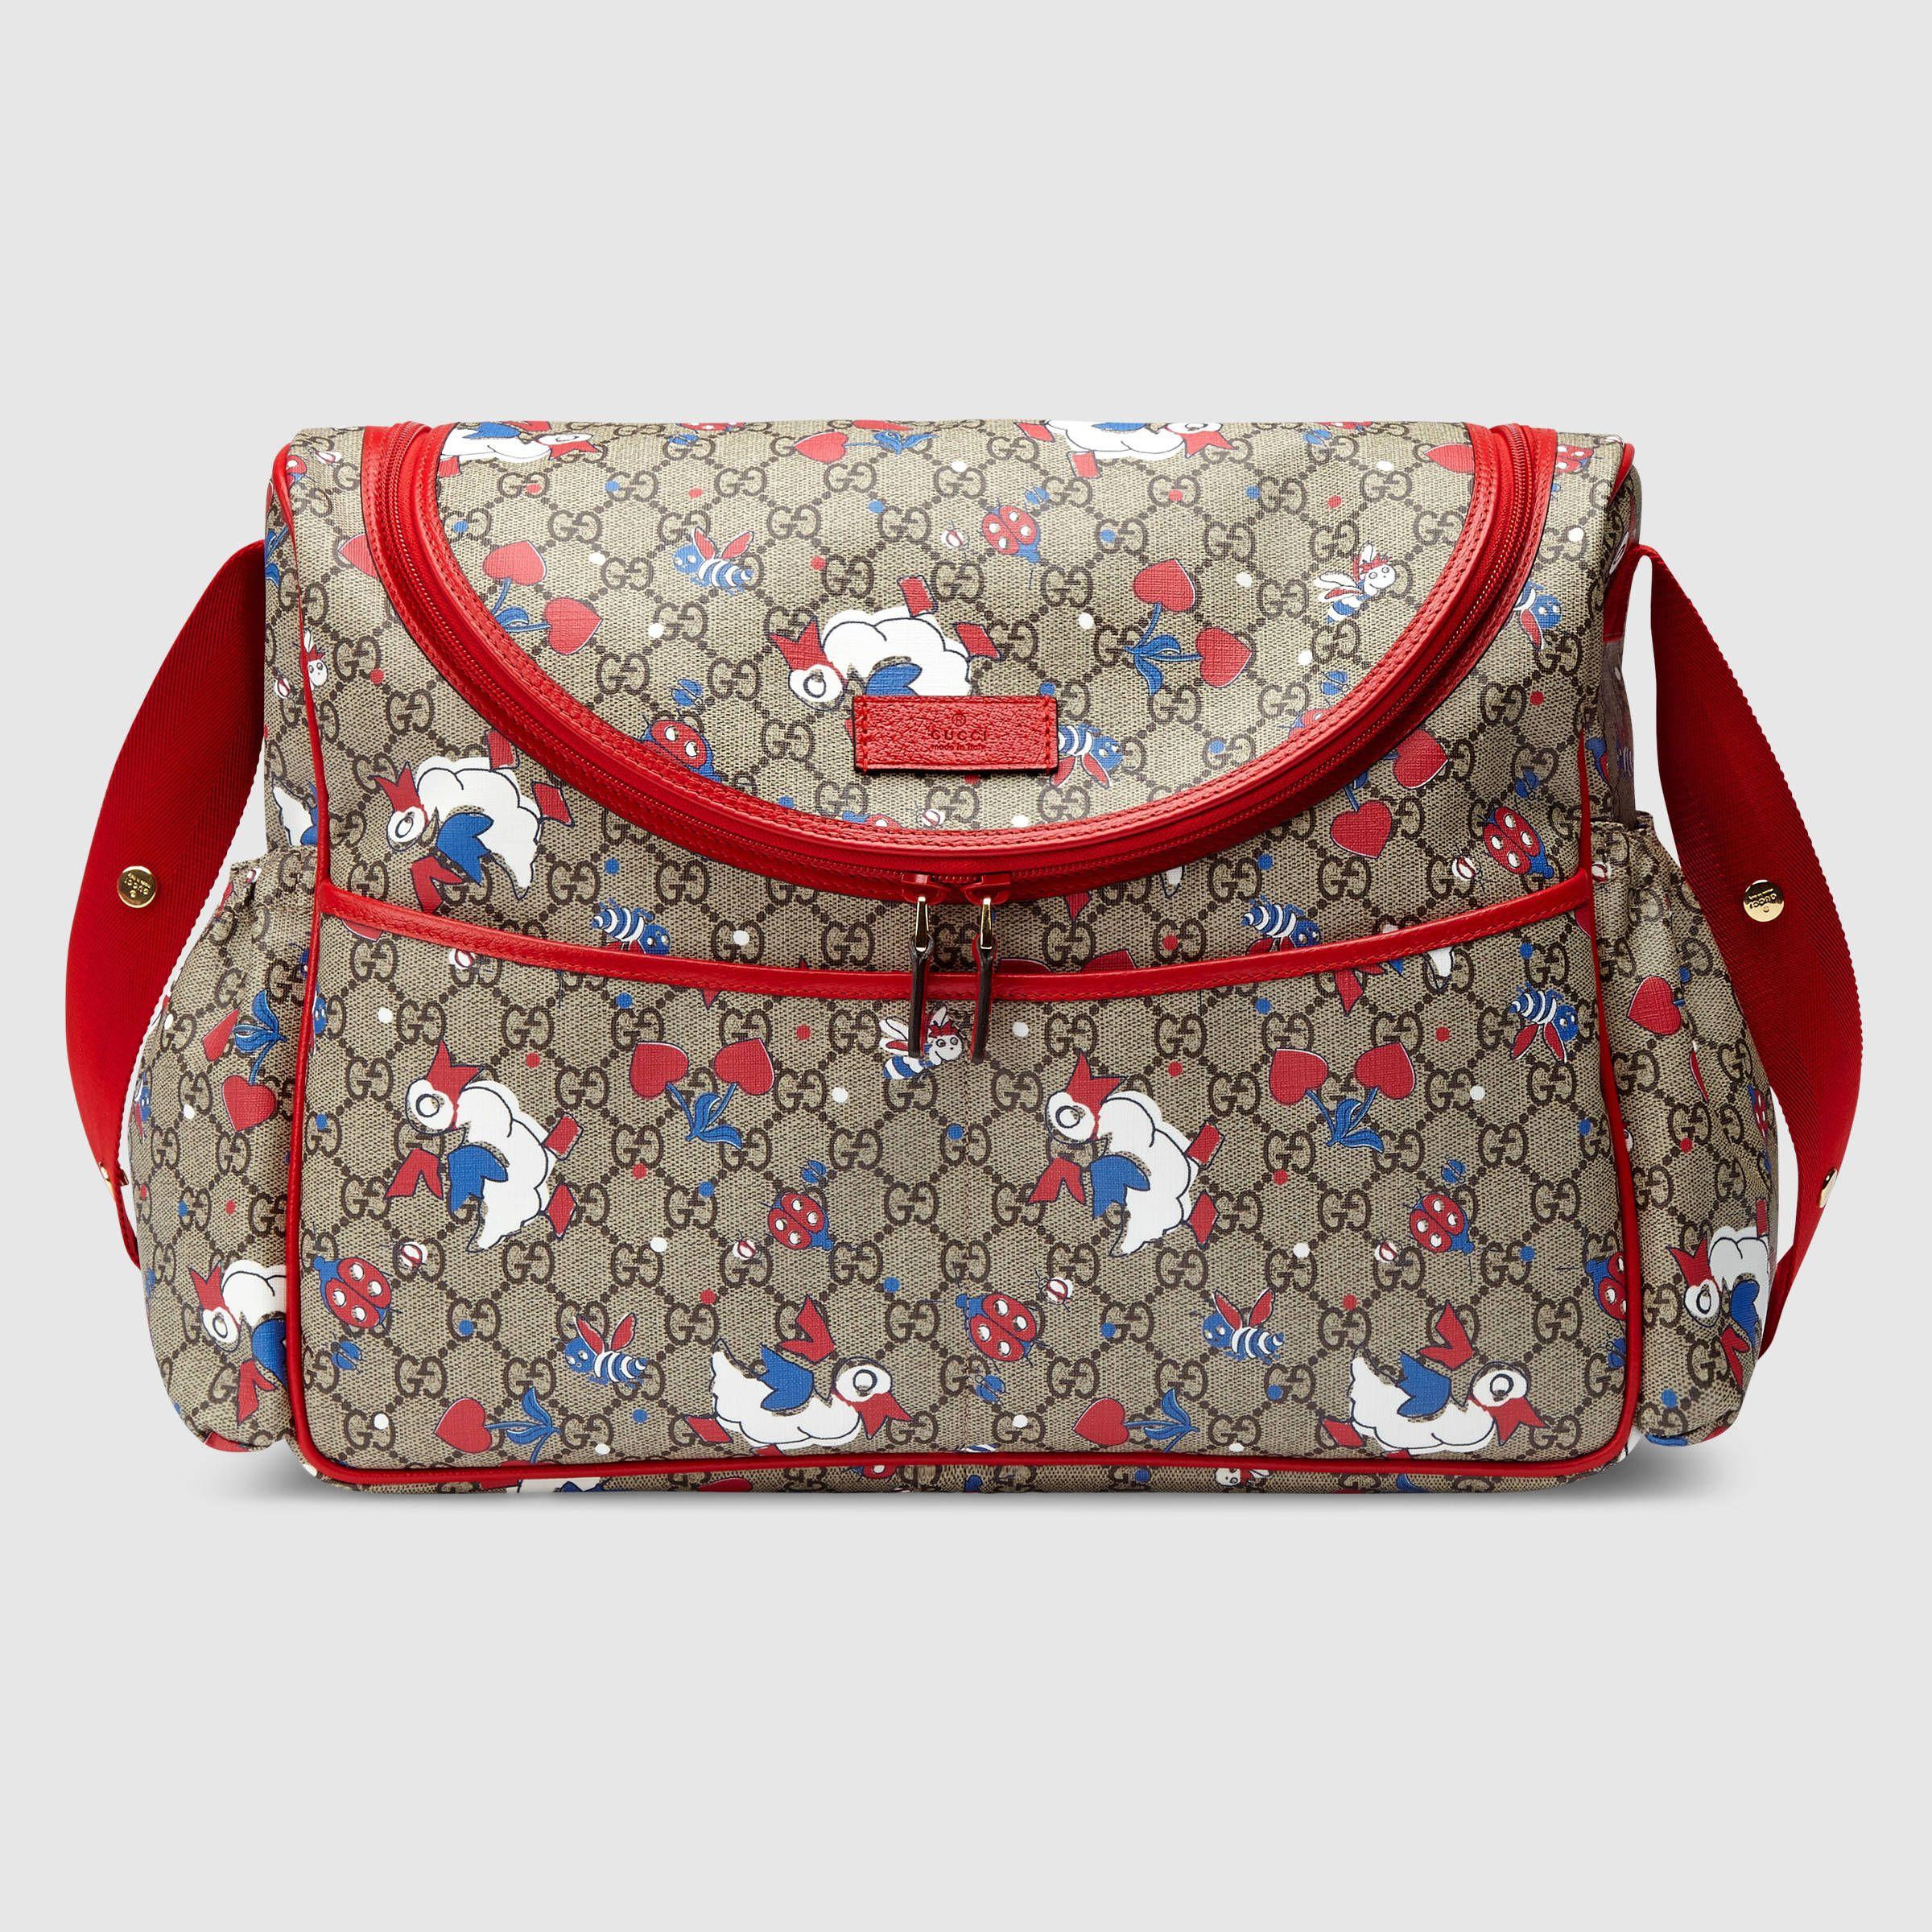 Gg Ducks Diaper Bag Gucci Diaper Bags Amp Totes